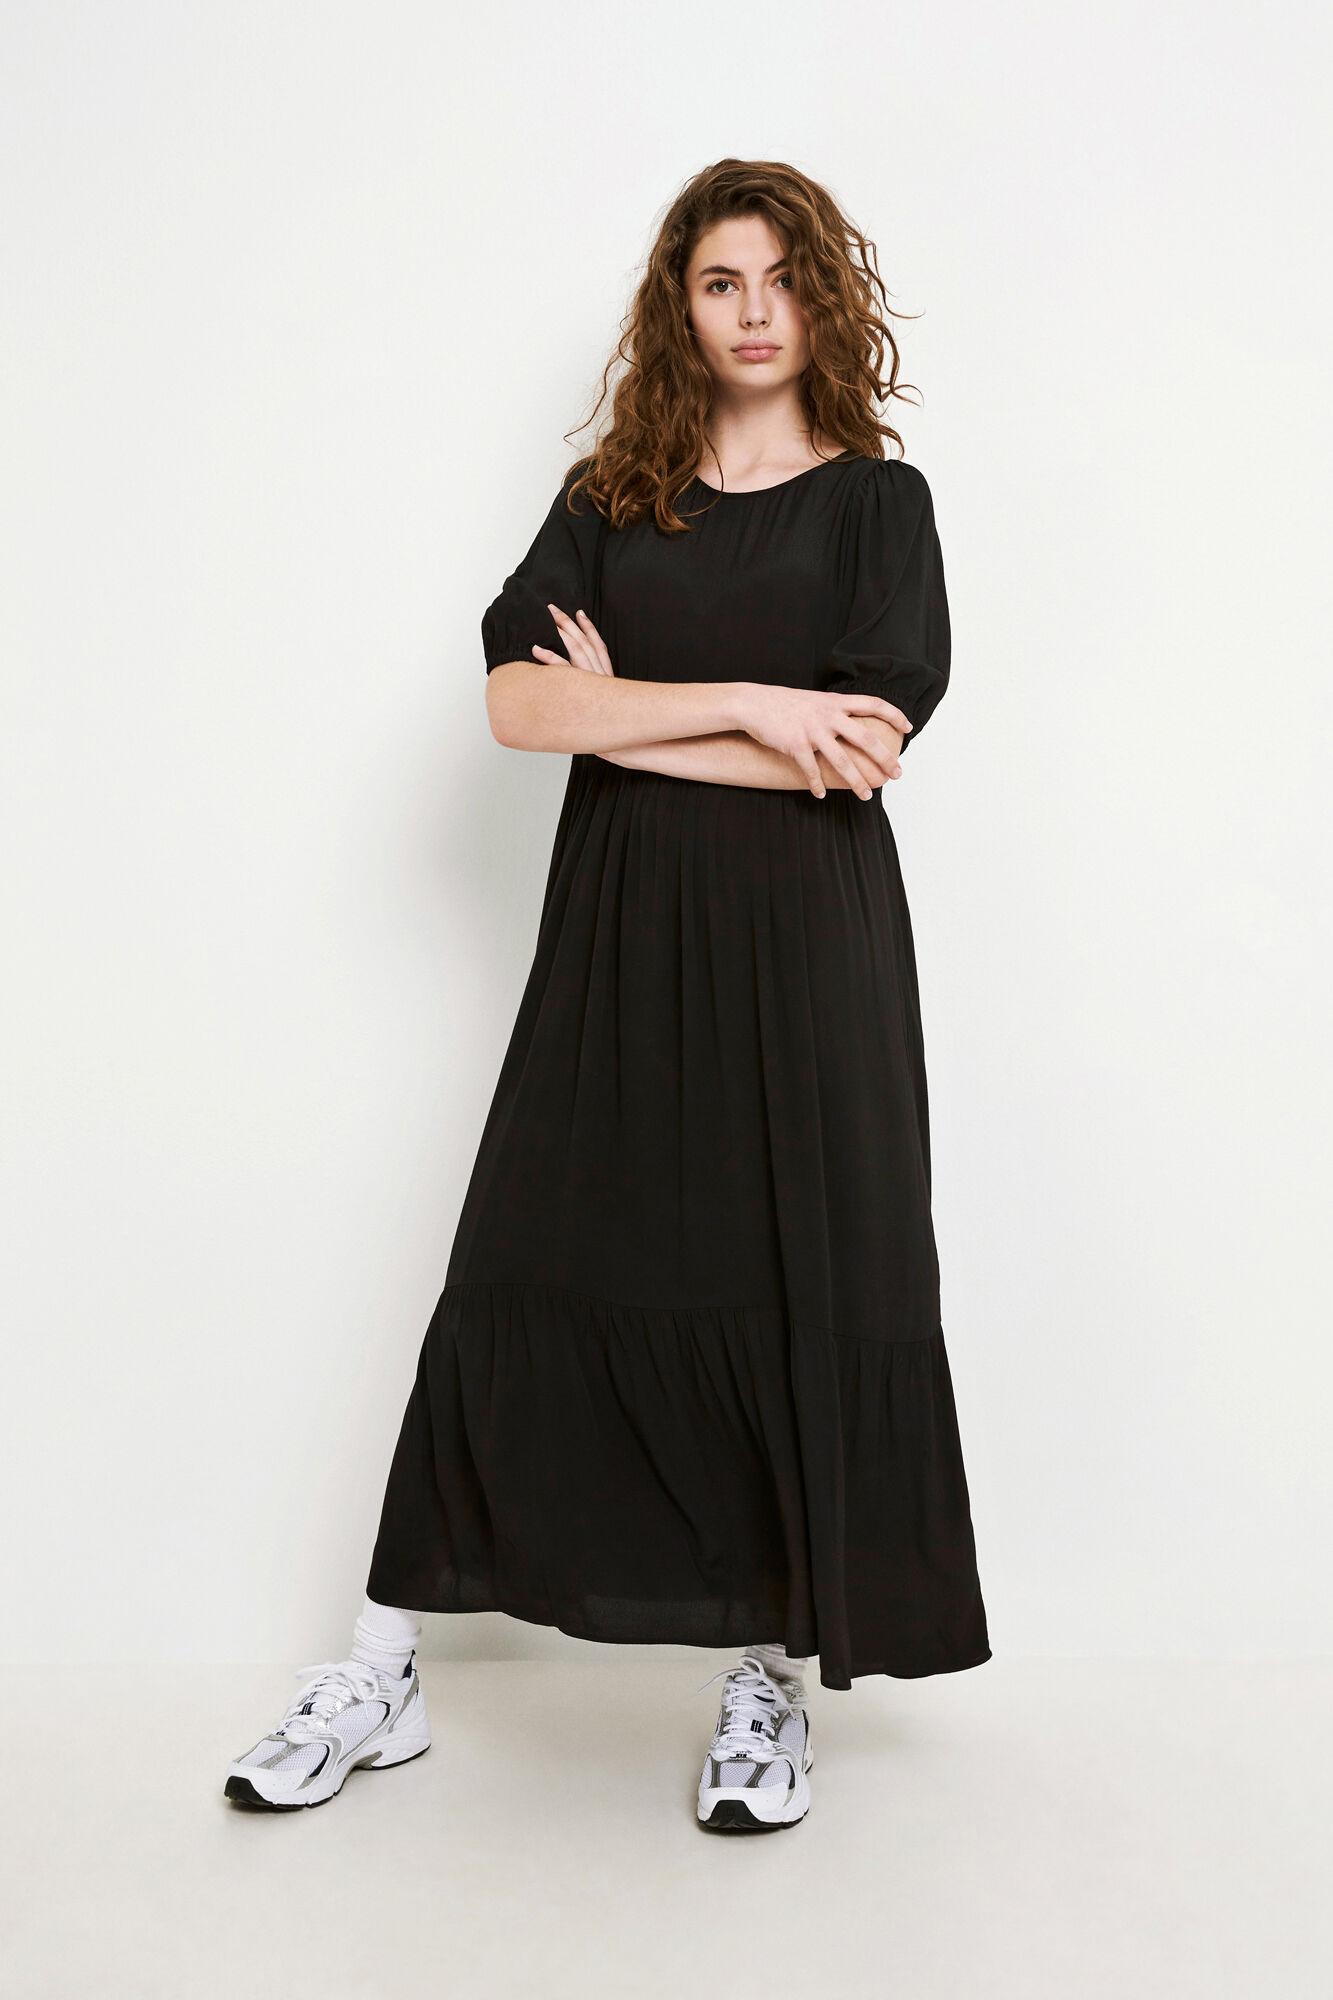 ENCLARA SS DRESS 6696